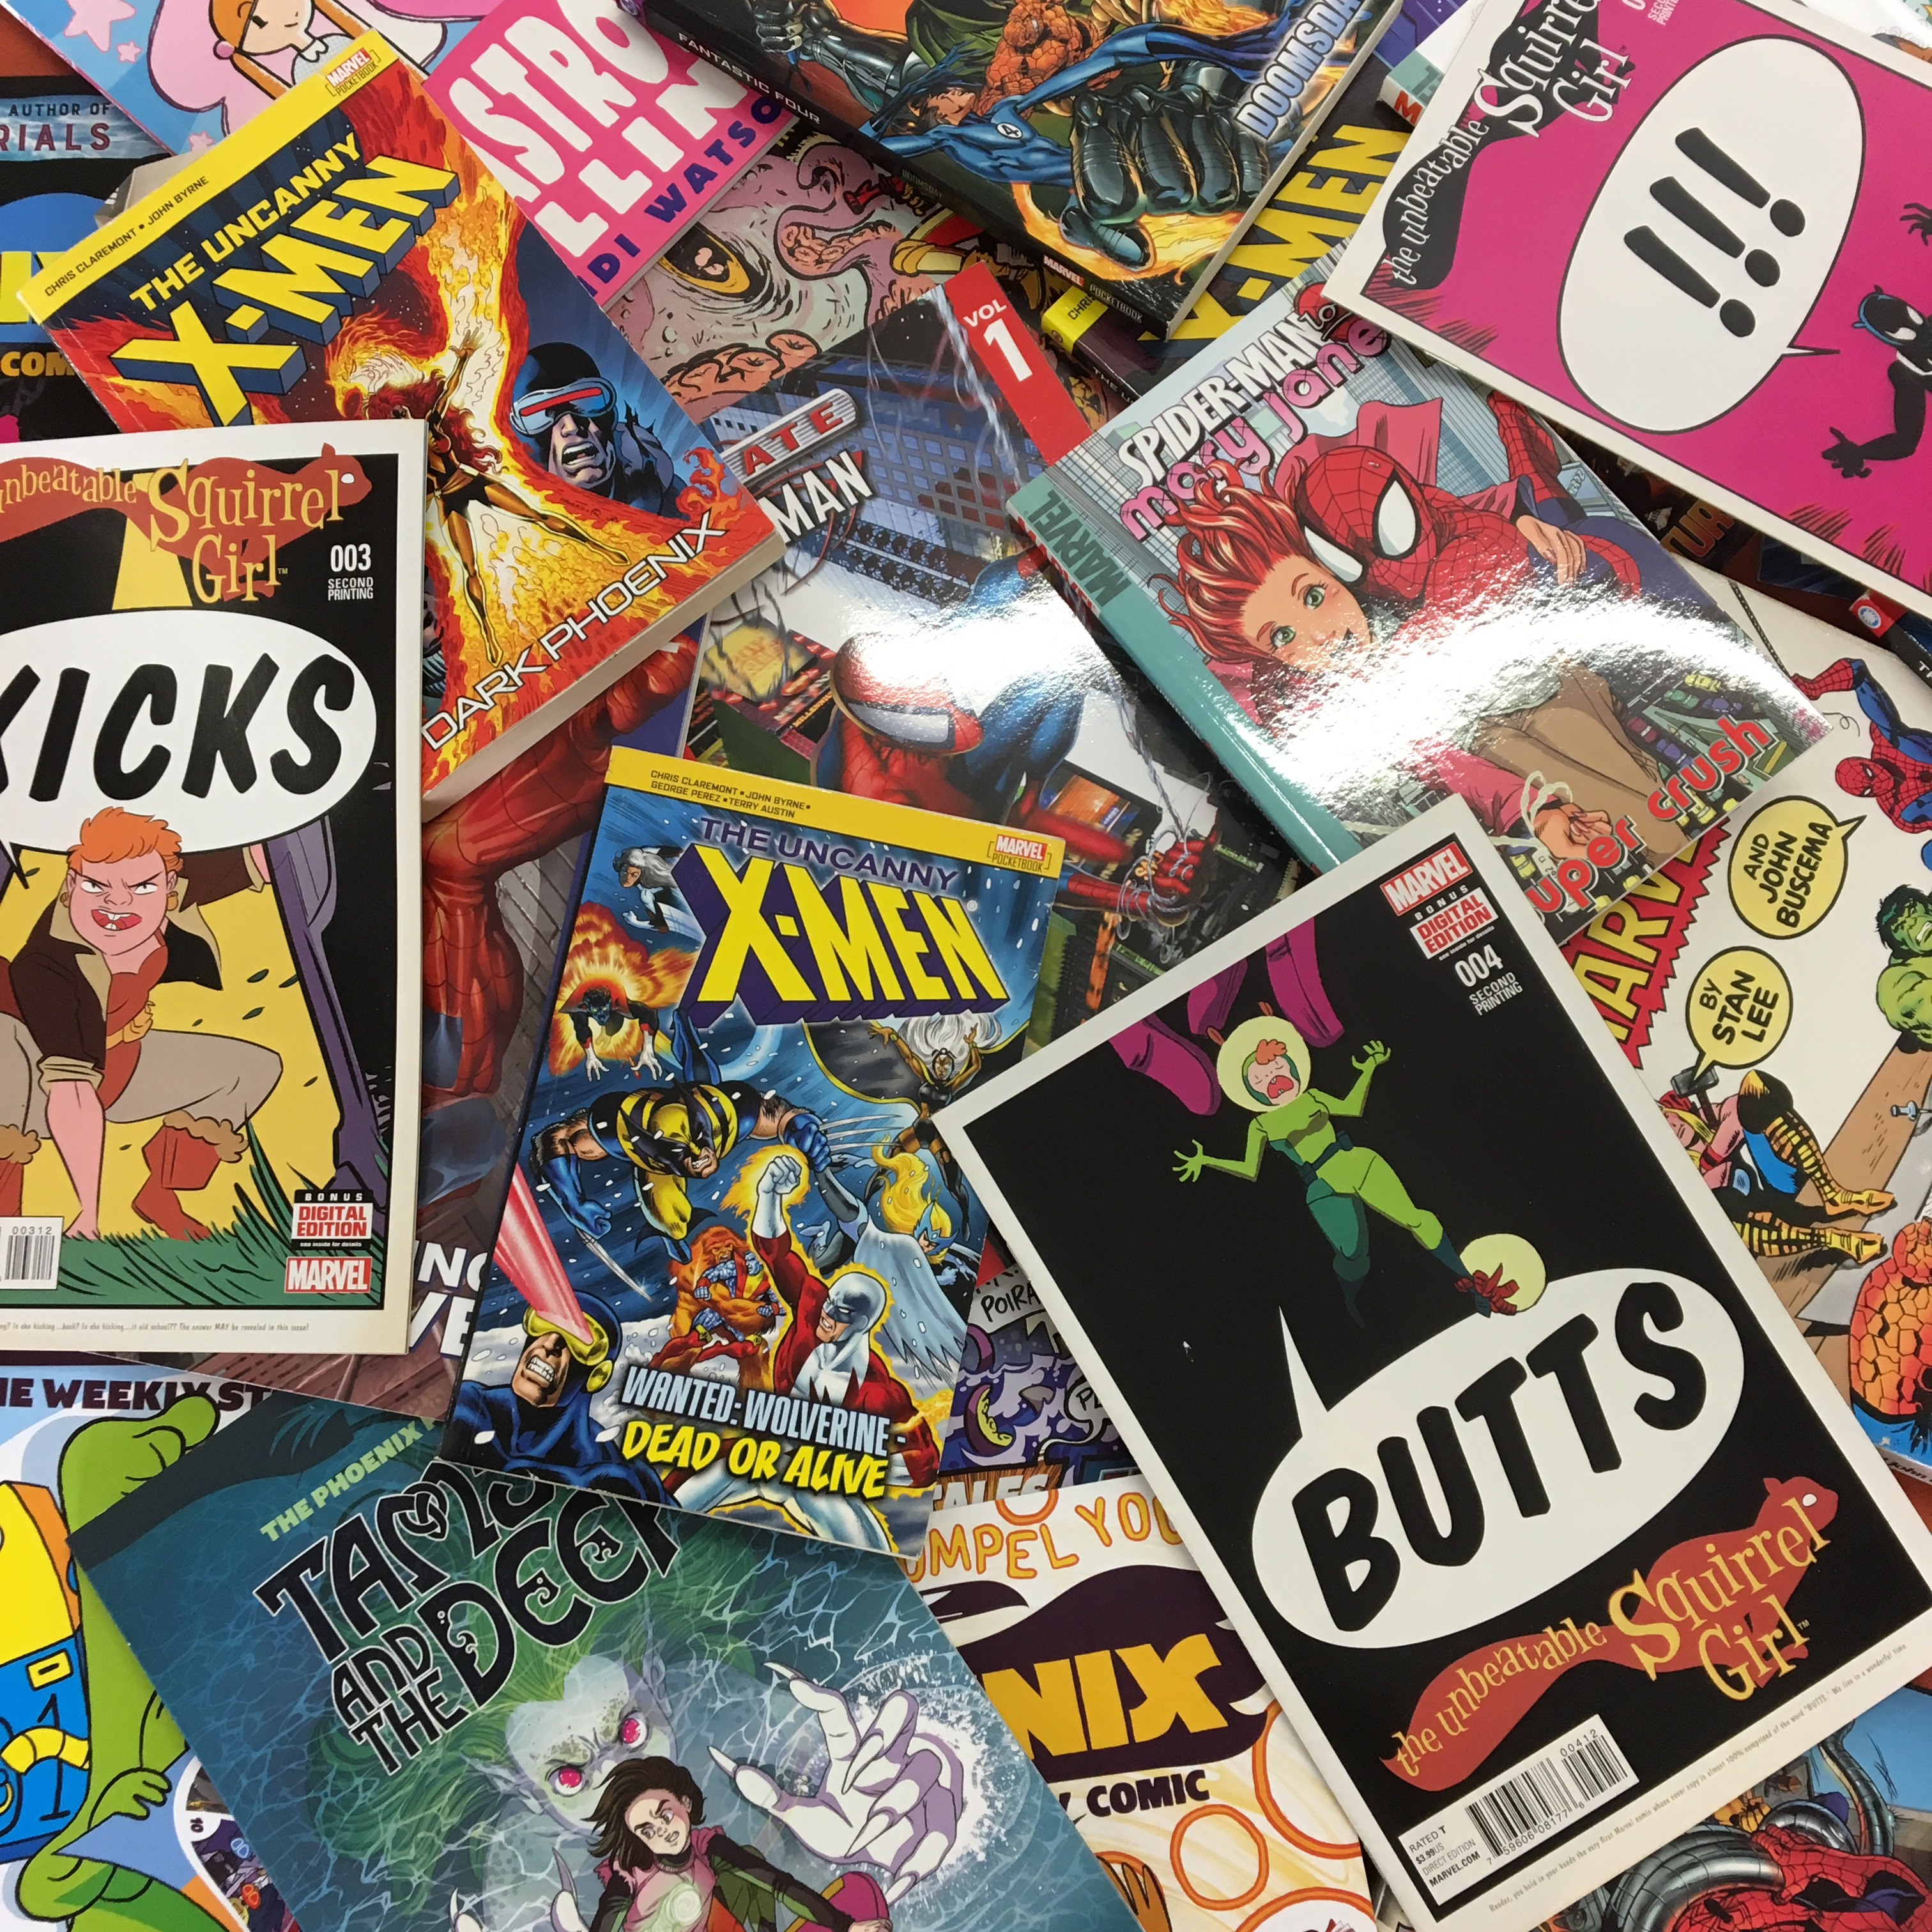 July Comics Challenge Make Your Own Superhero Comics Club